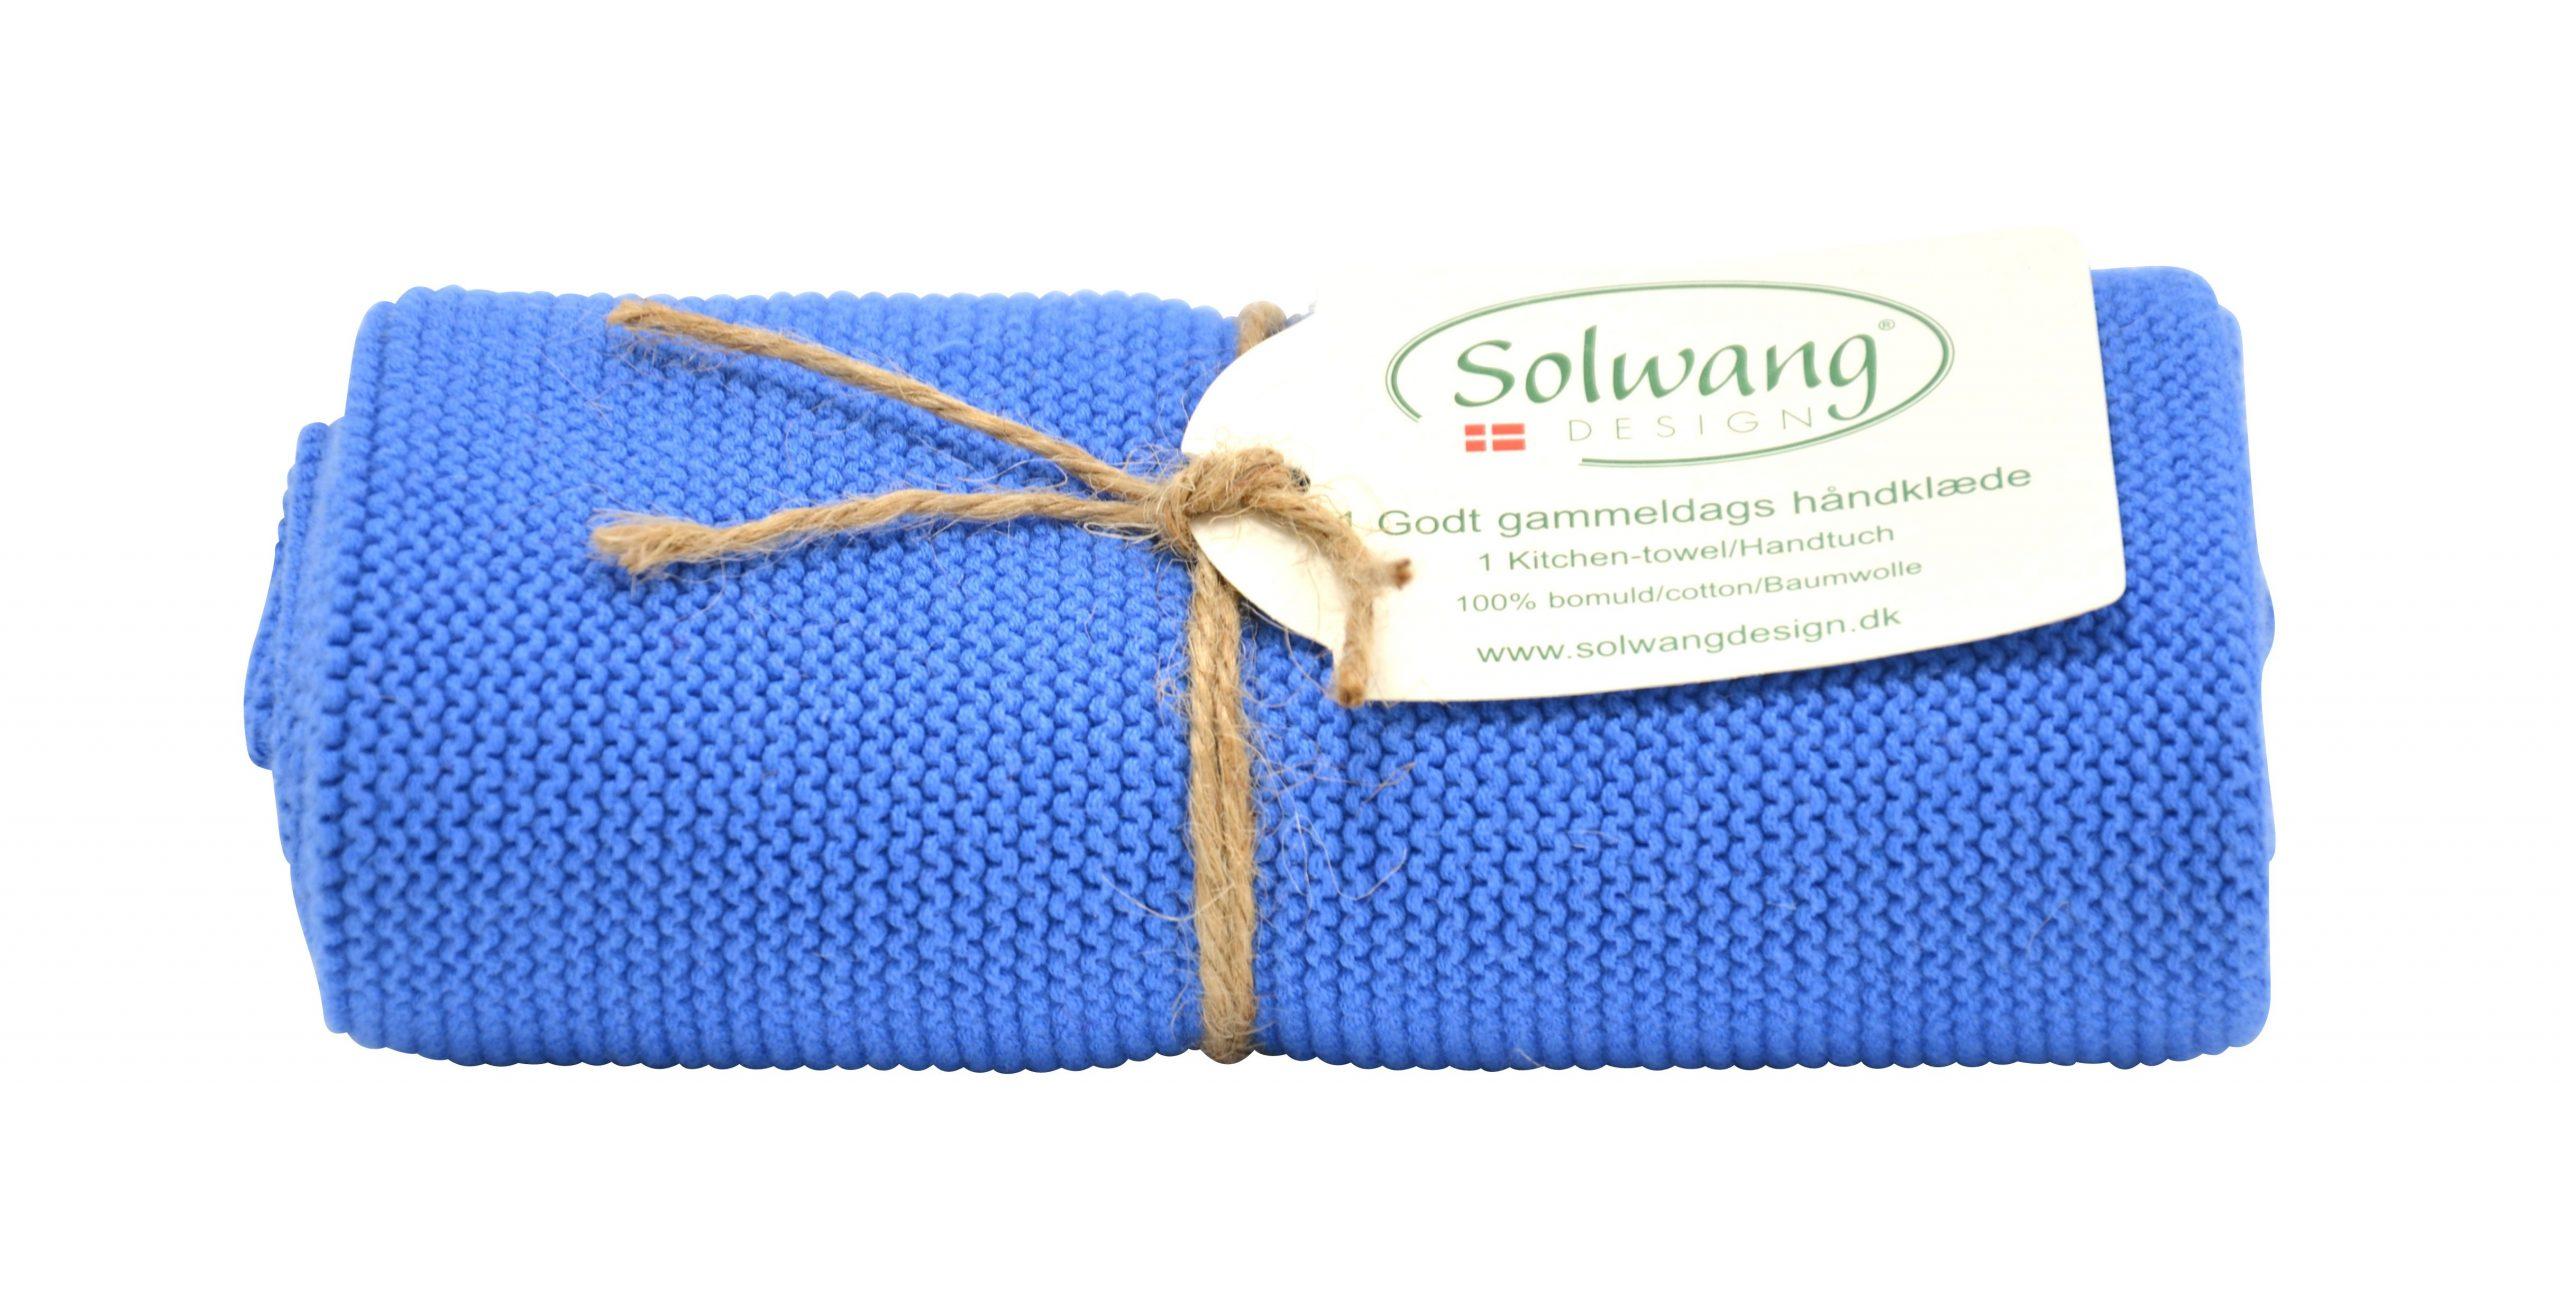 Solwang Handtuch klares Blau